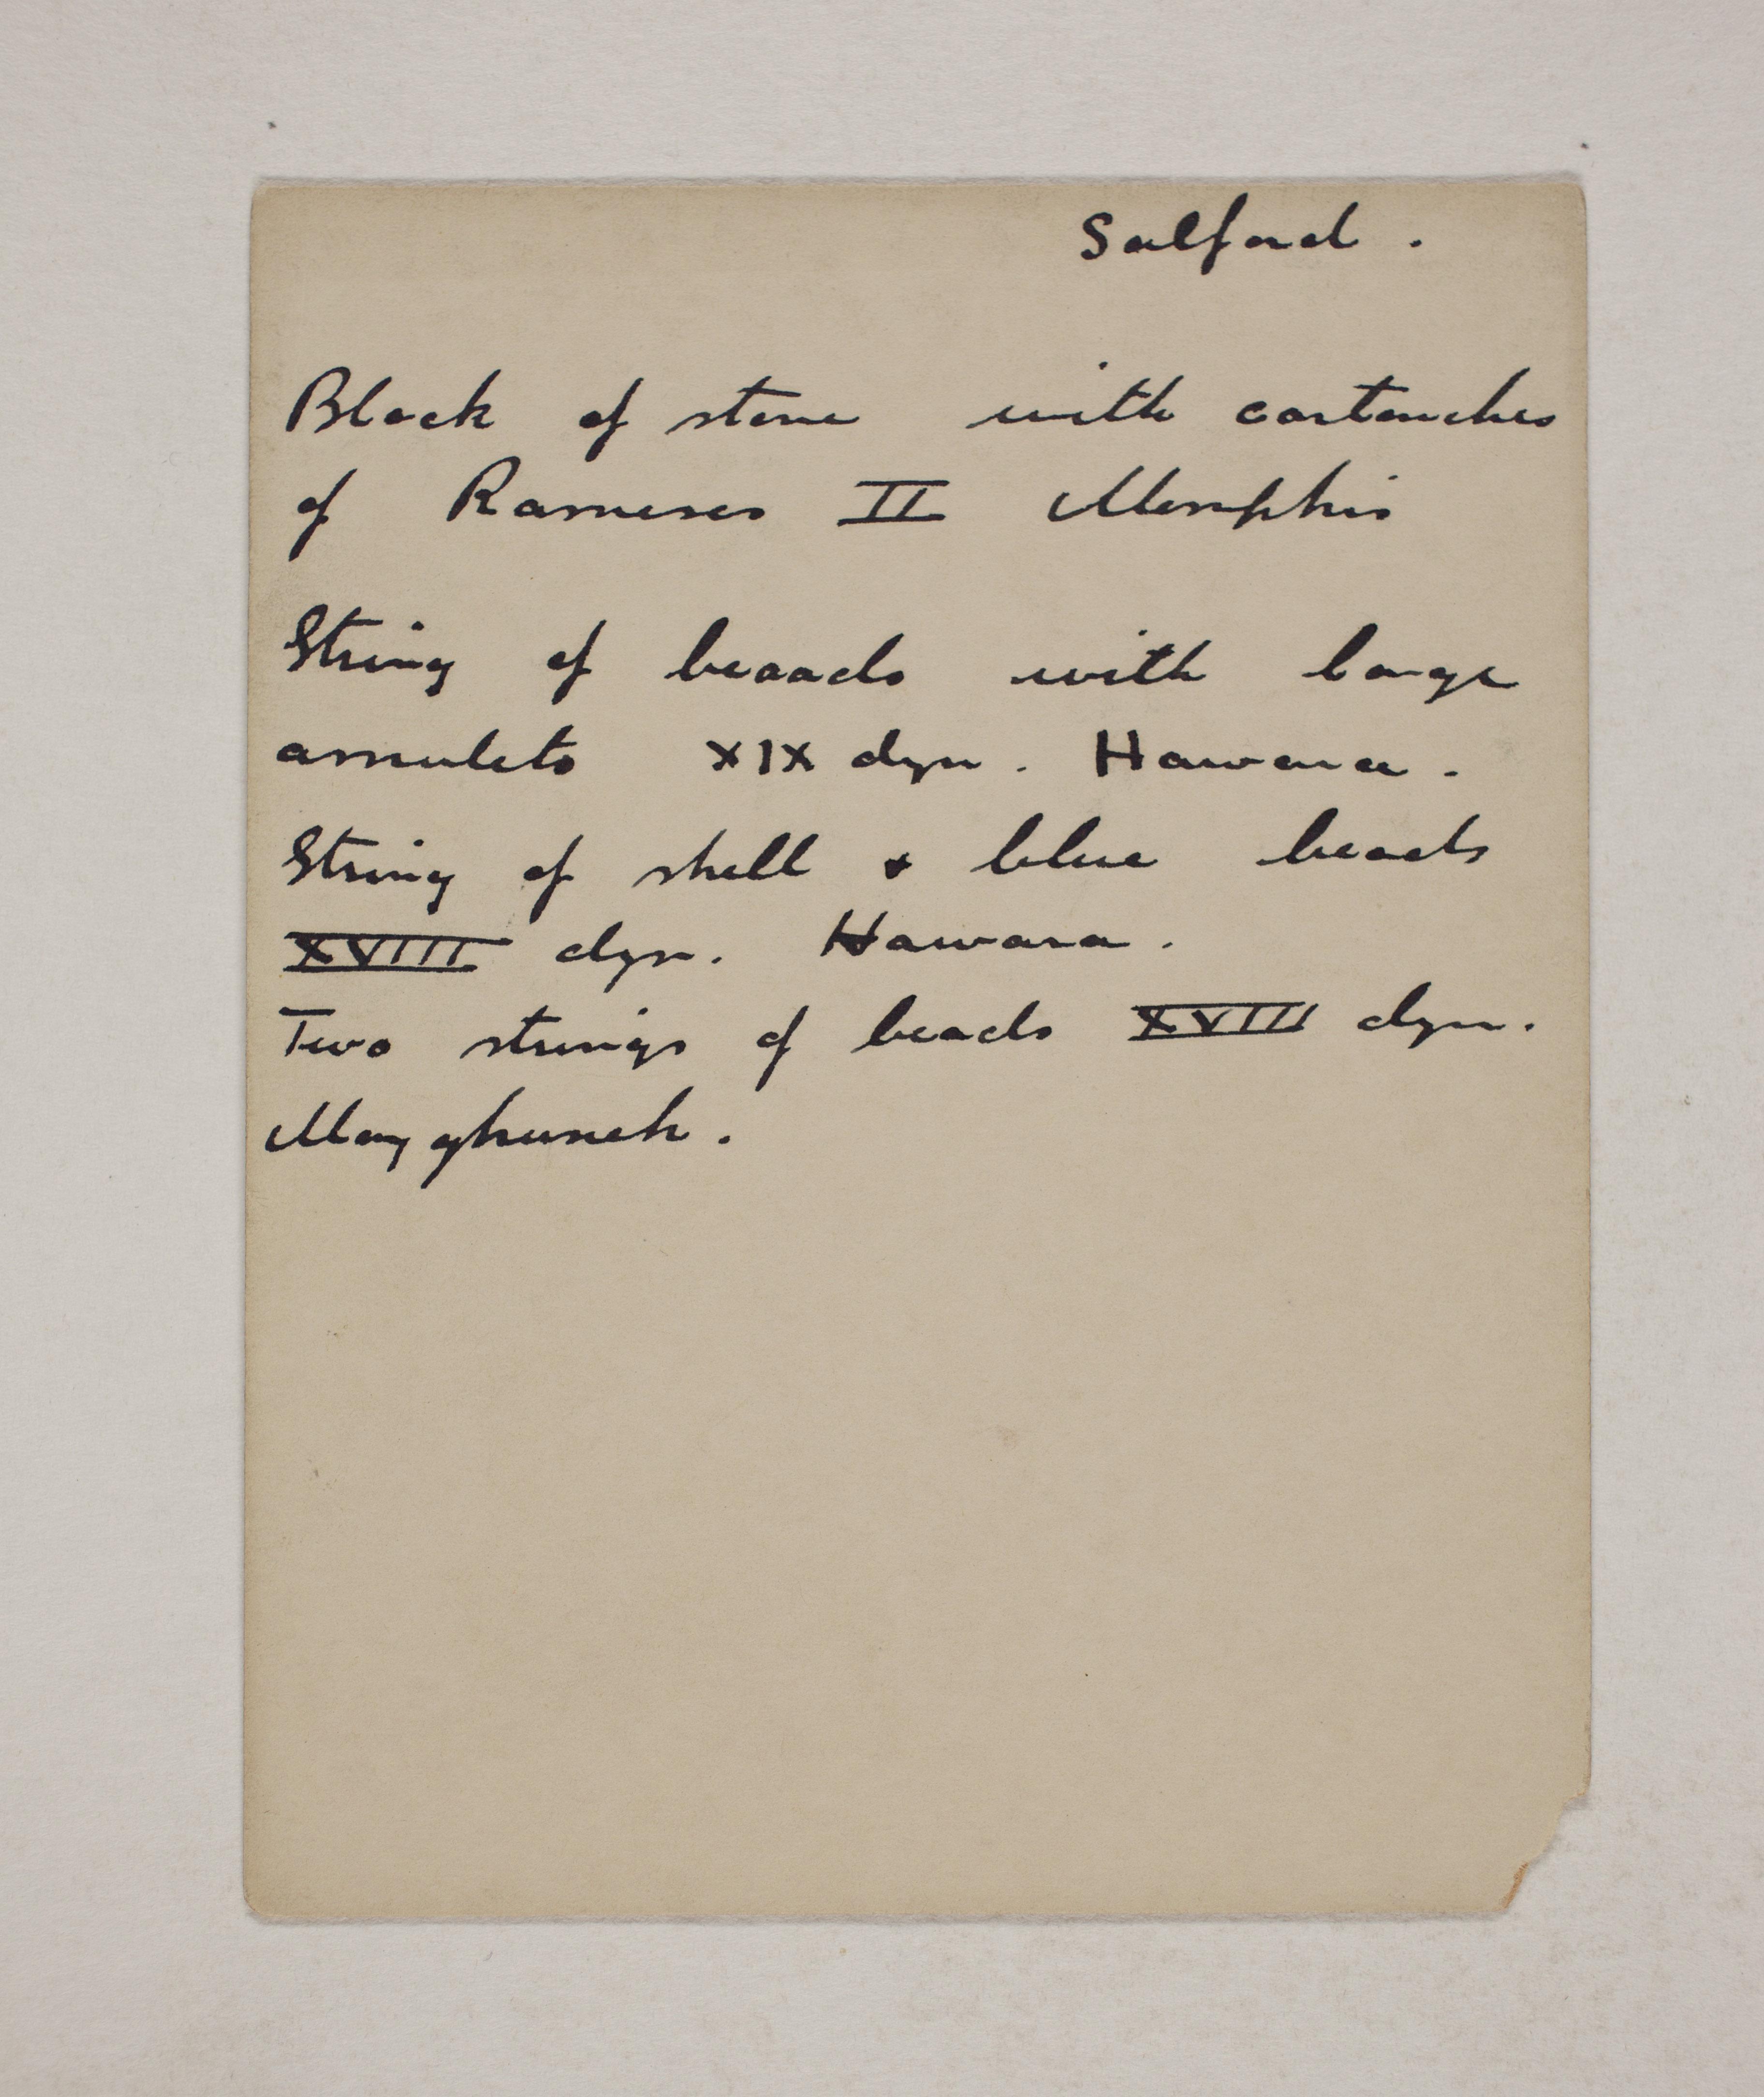 1910-11 Hawara, Gerzeh, Memphis, Mazghuneh Individual institution list  PMA/WFP1/D/19/31